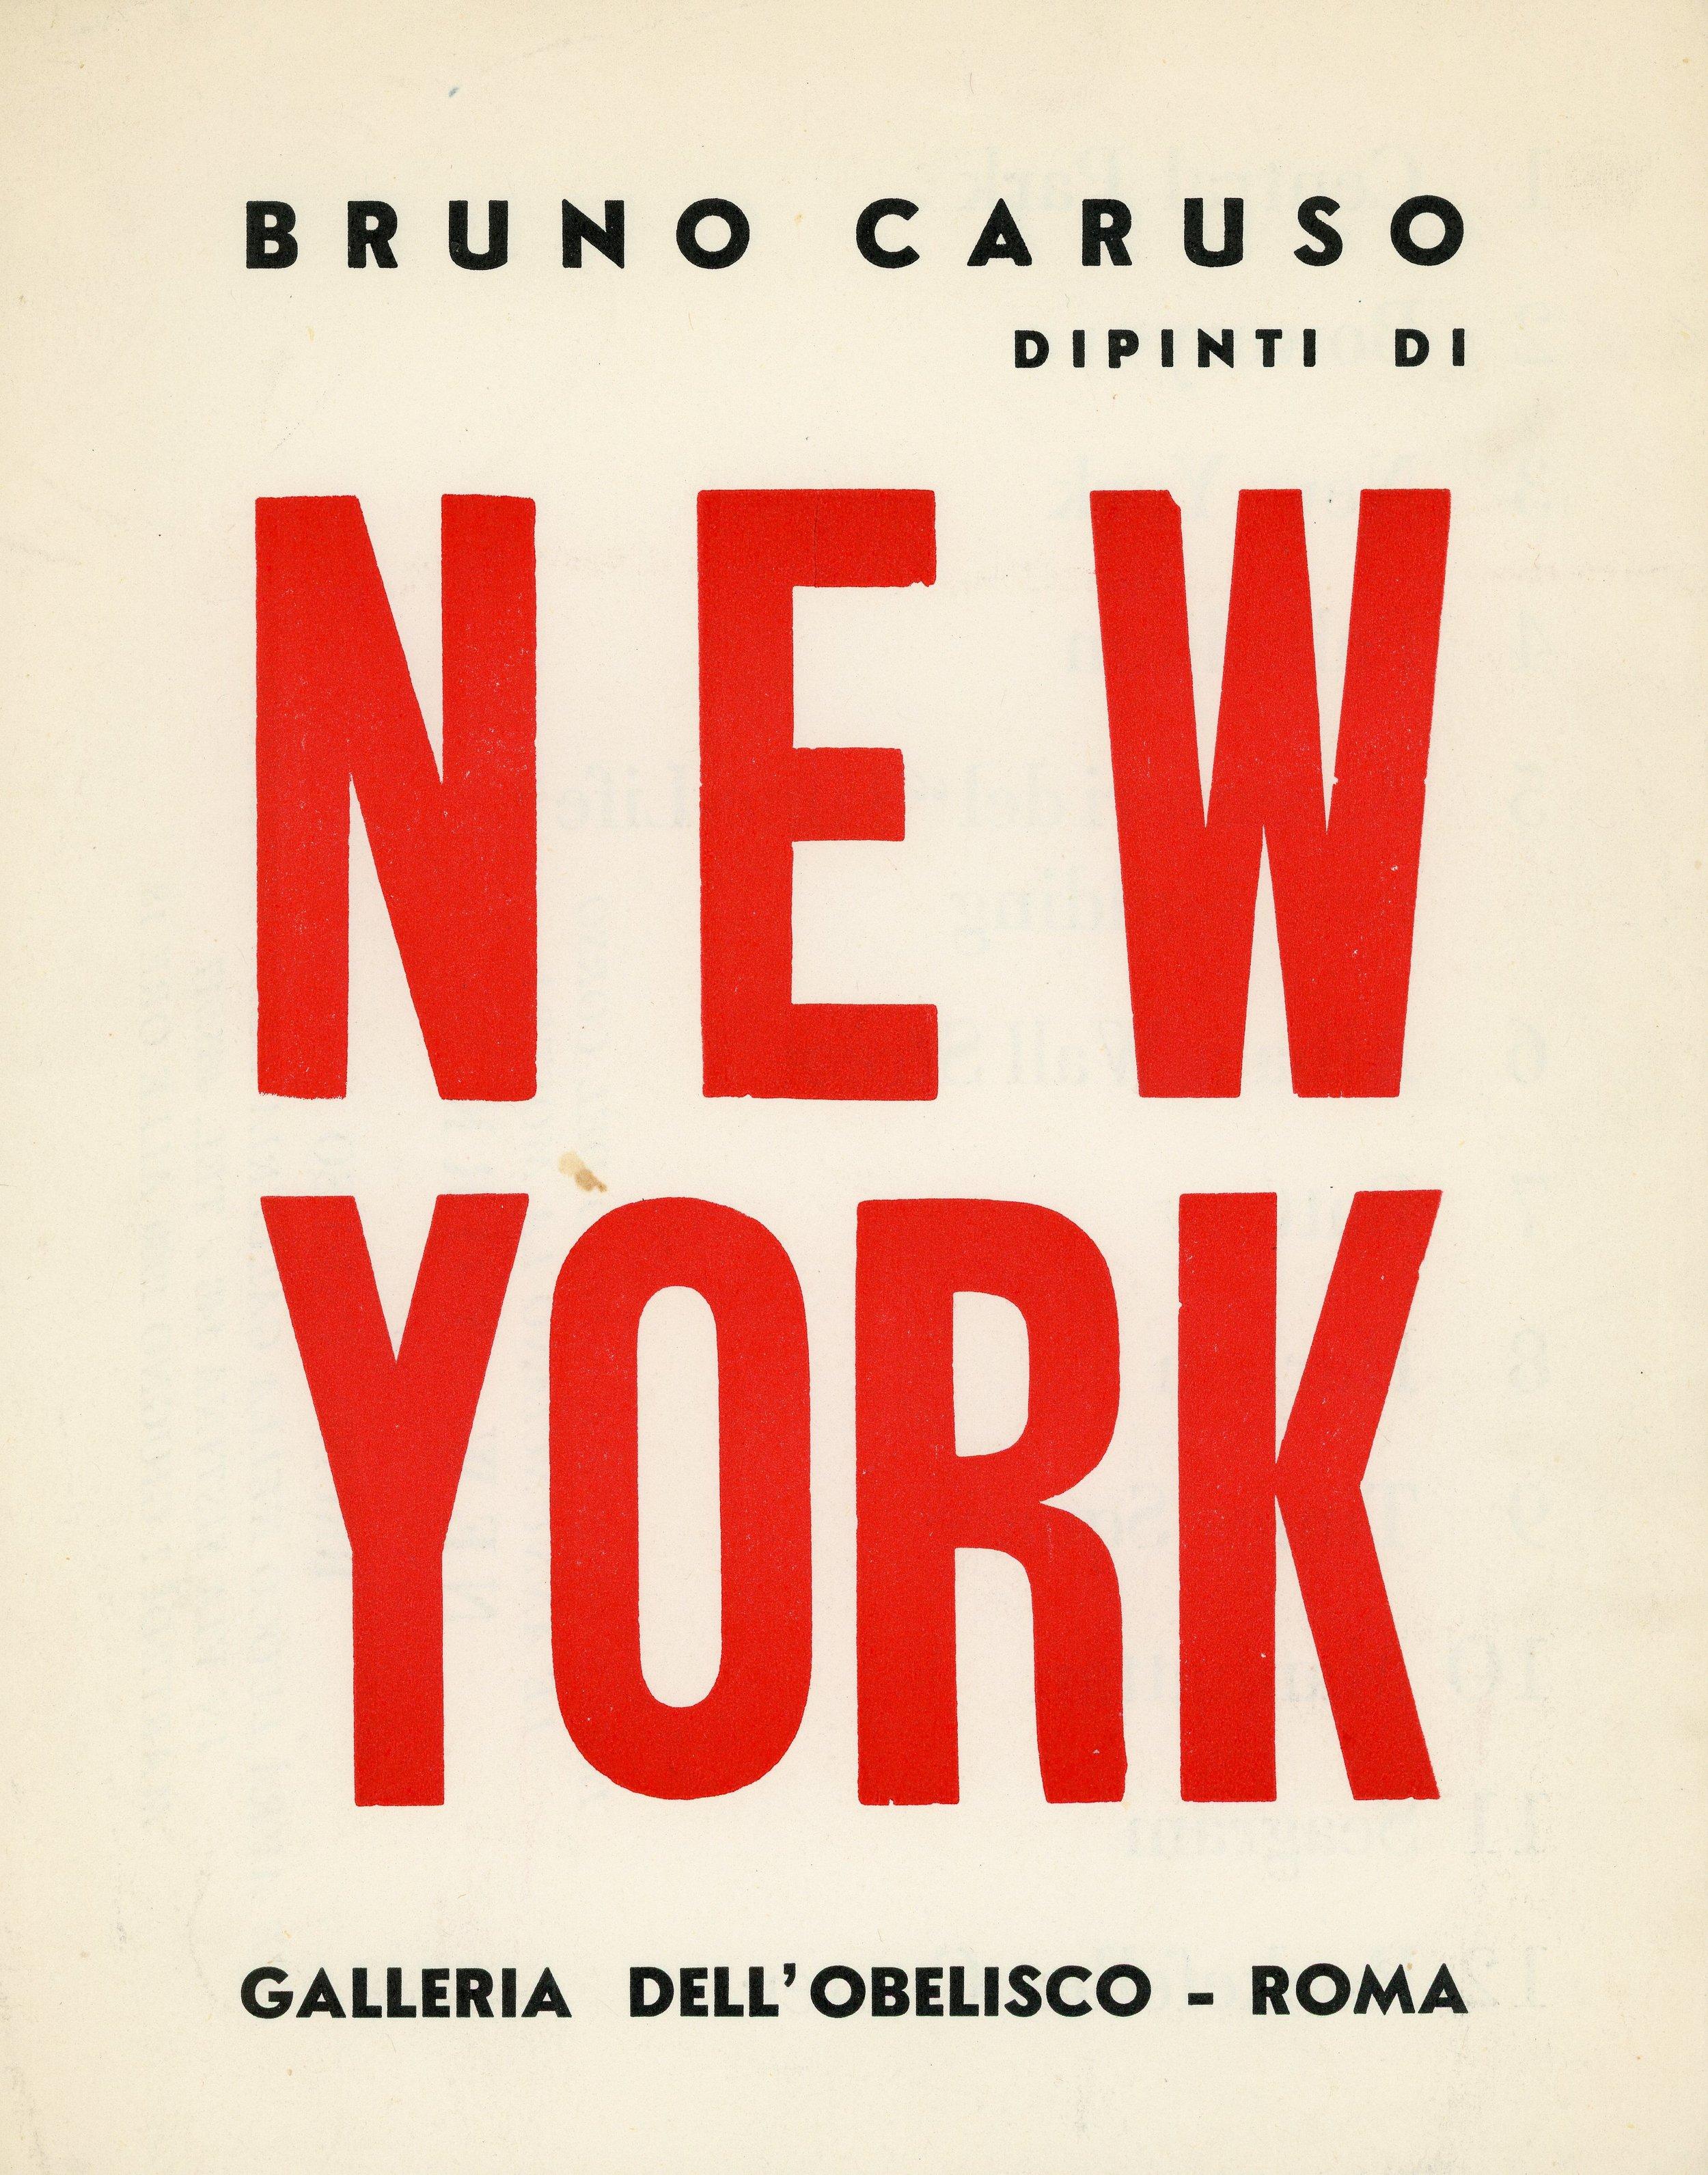 1960-06 Obelisco - Bruno Caruso_01.jpg